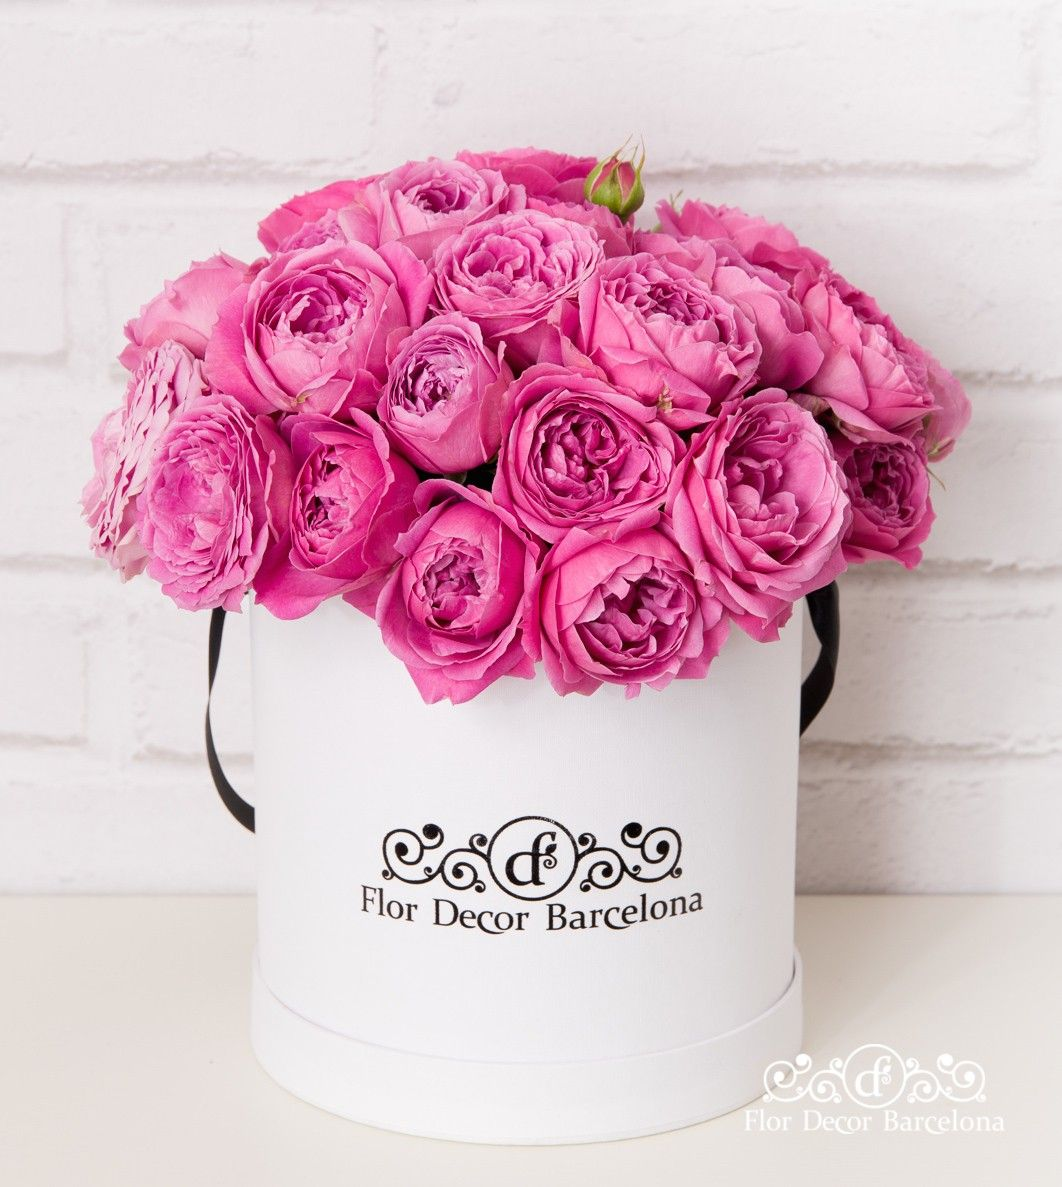 Next stop pinterest cajas de rosas proyecto jl pinterest buy lid and base style flower bouquet boxes carton tube for flower packaging izmirmasajfo